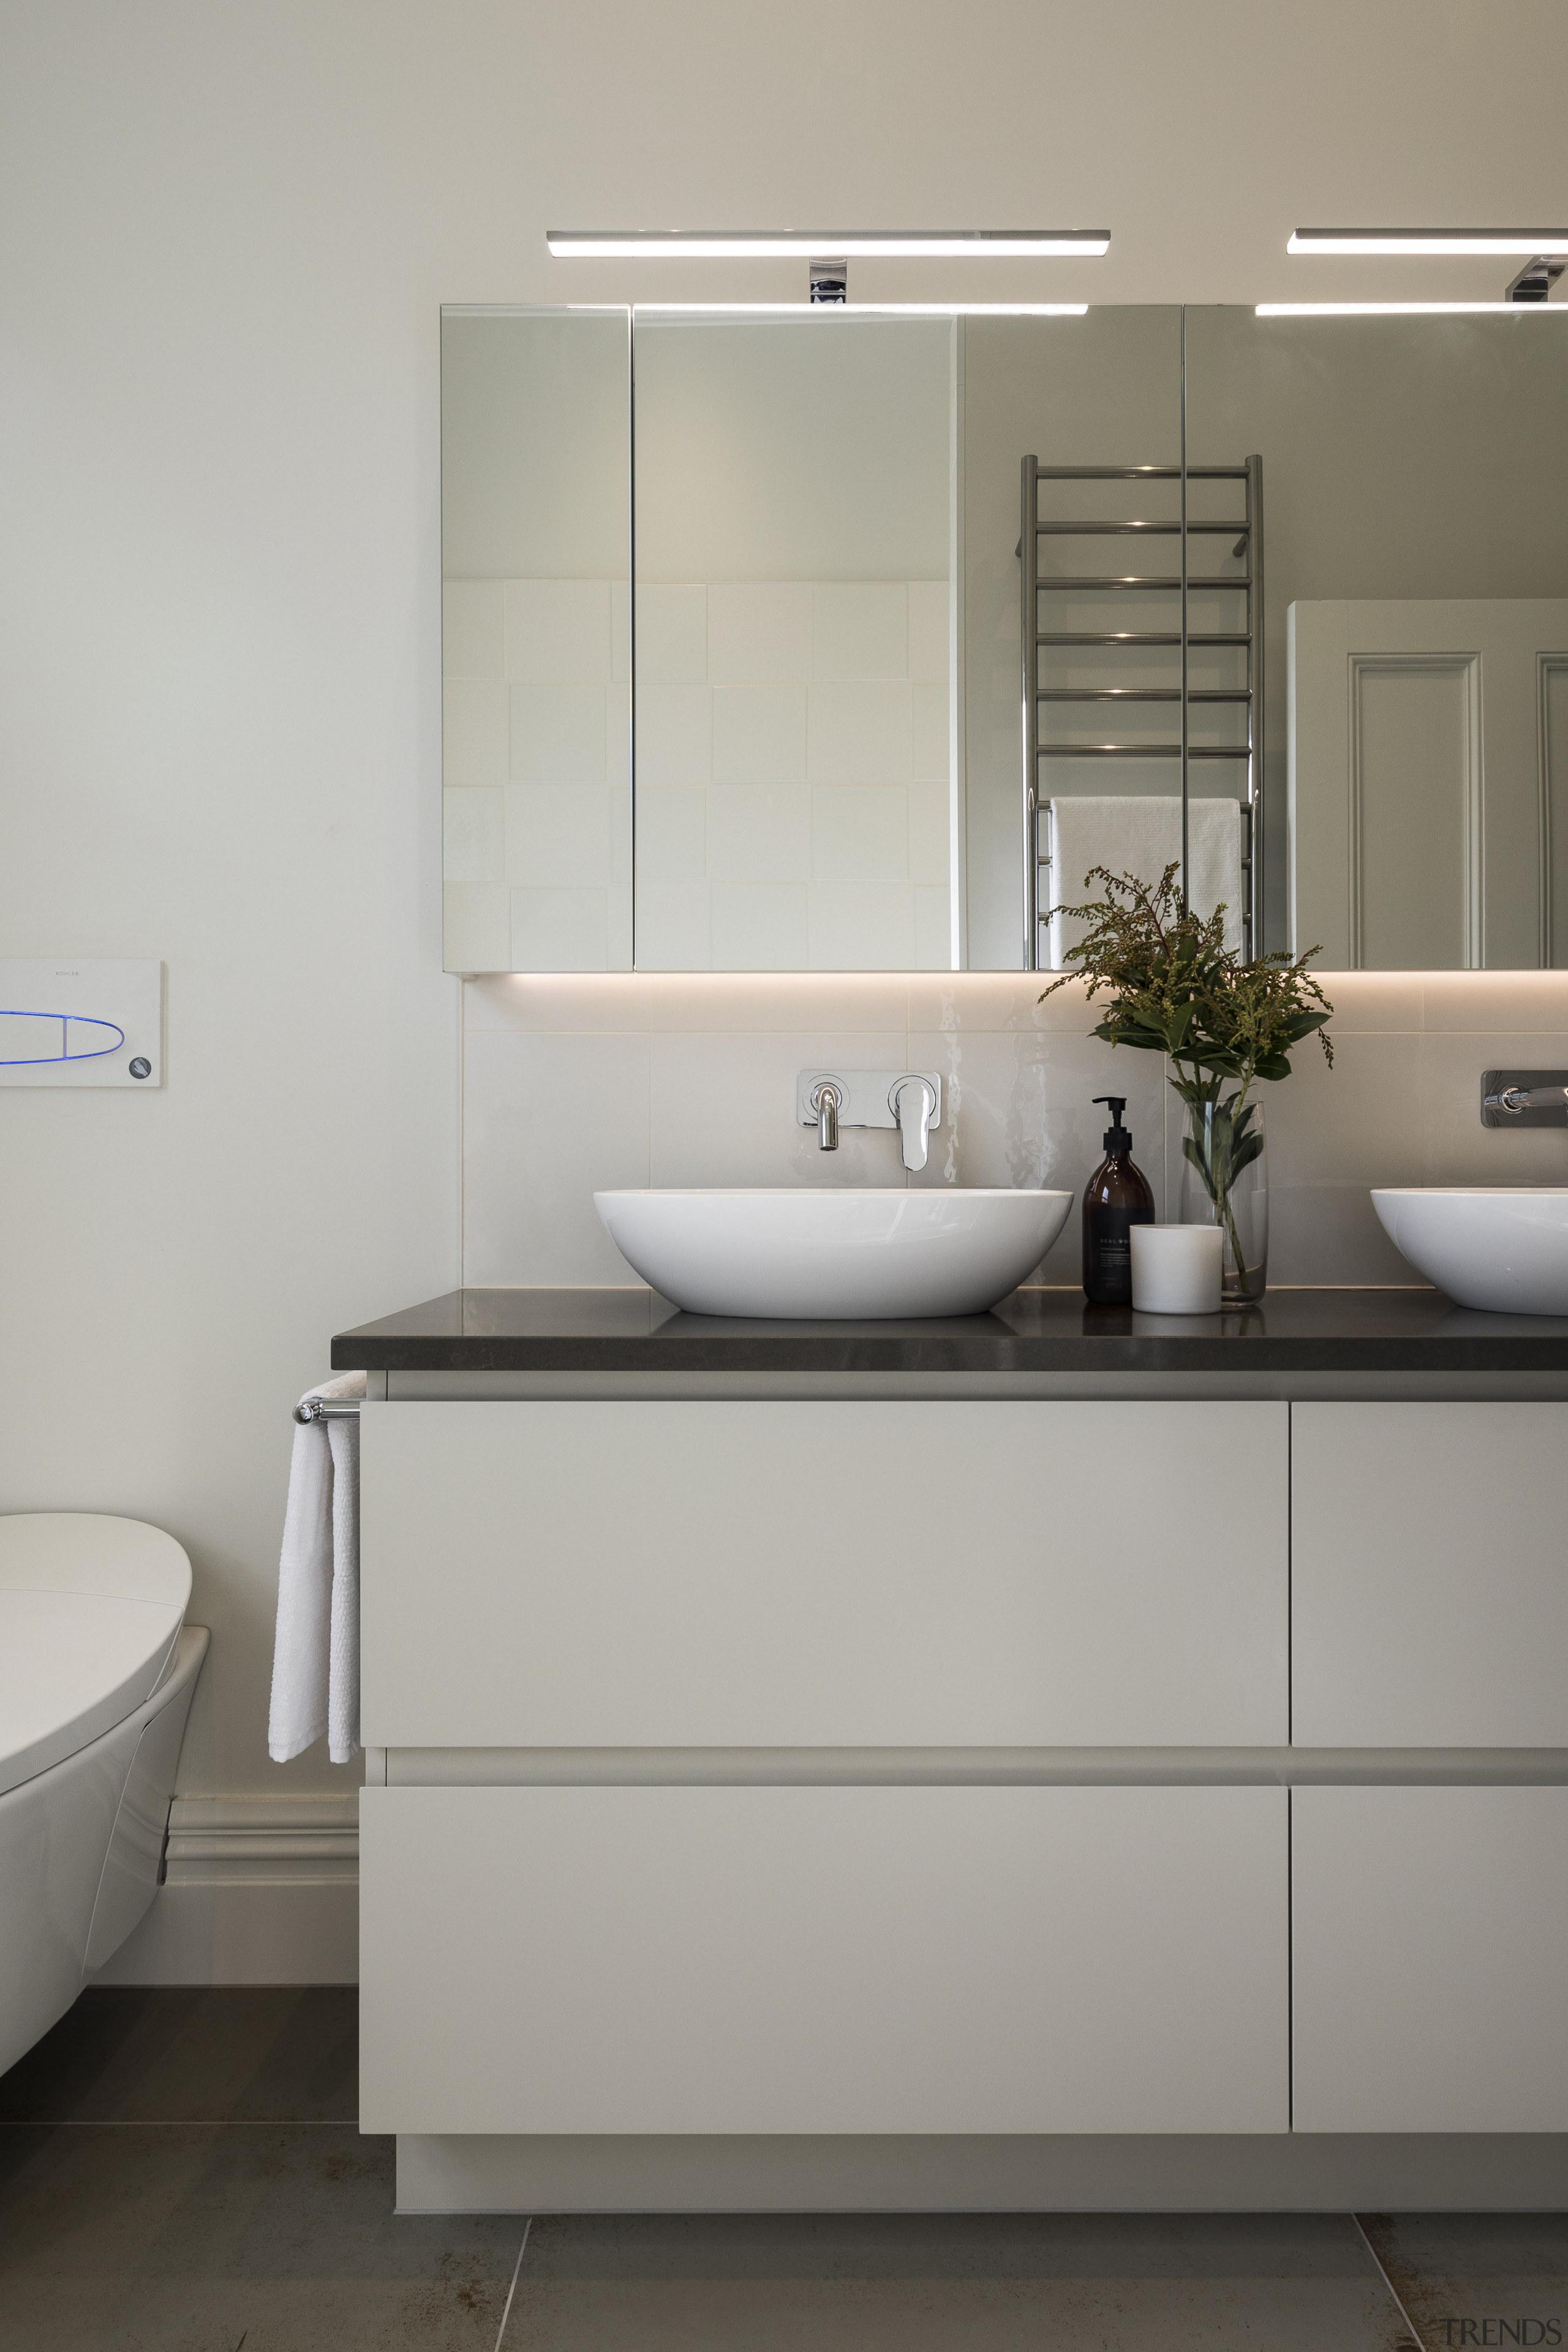 Recessed handles and benchtop vessels that echo the bathroom, bathroom accessory, bathroom cabinet, bathroom sink, interior design, plumbing fixture, product design, room, sink, tap, gray